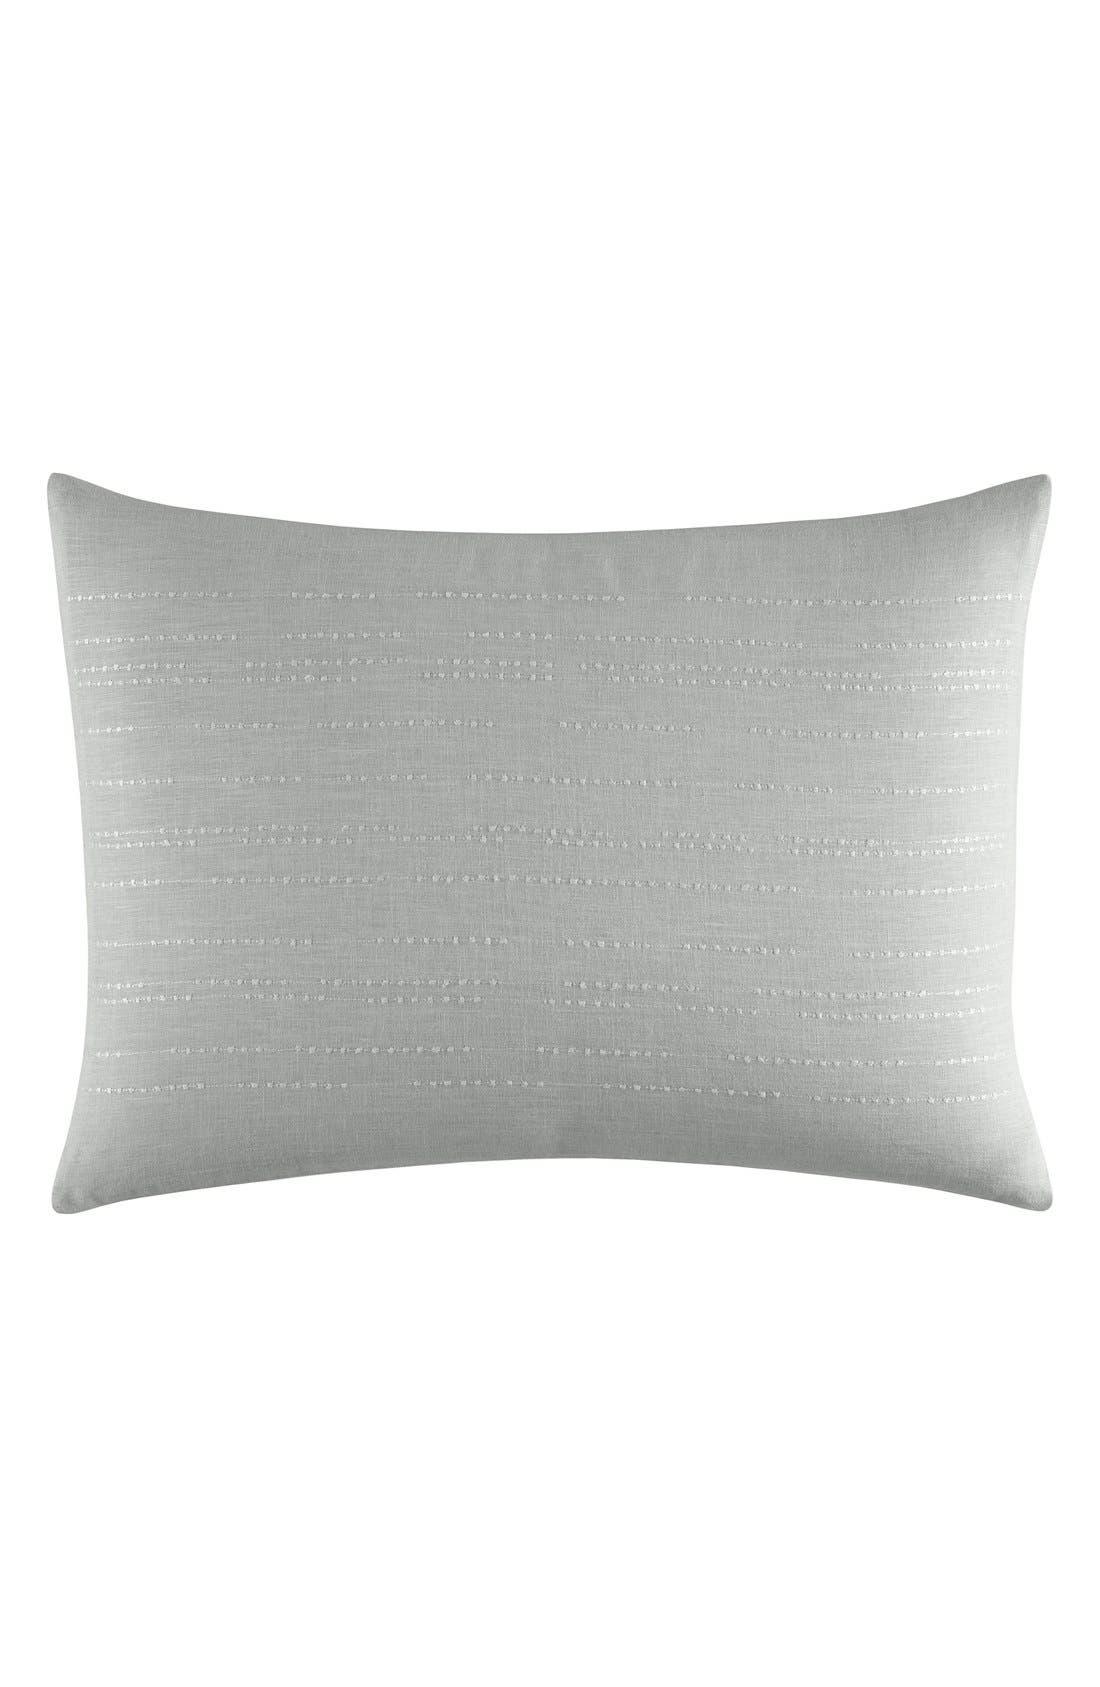 Alternate Image 1 Selected - Vera Wang 'Painted Stripe' Pillow